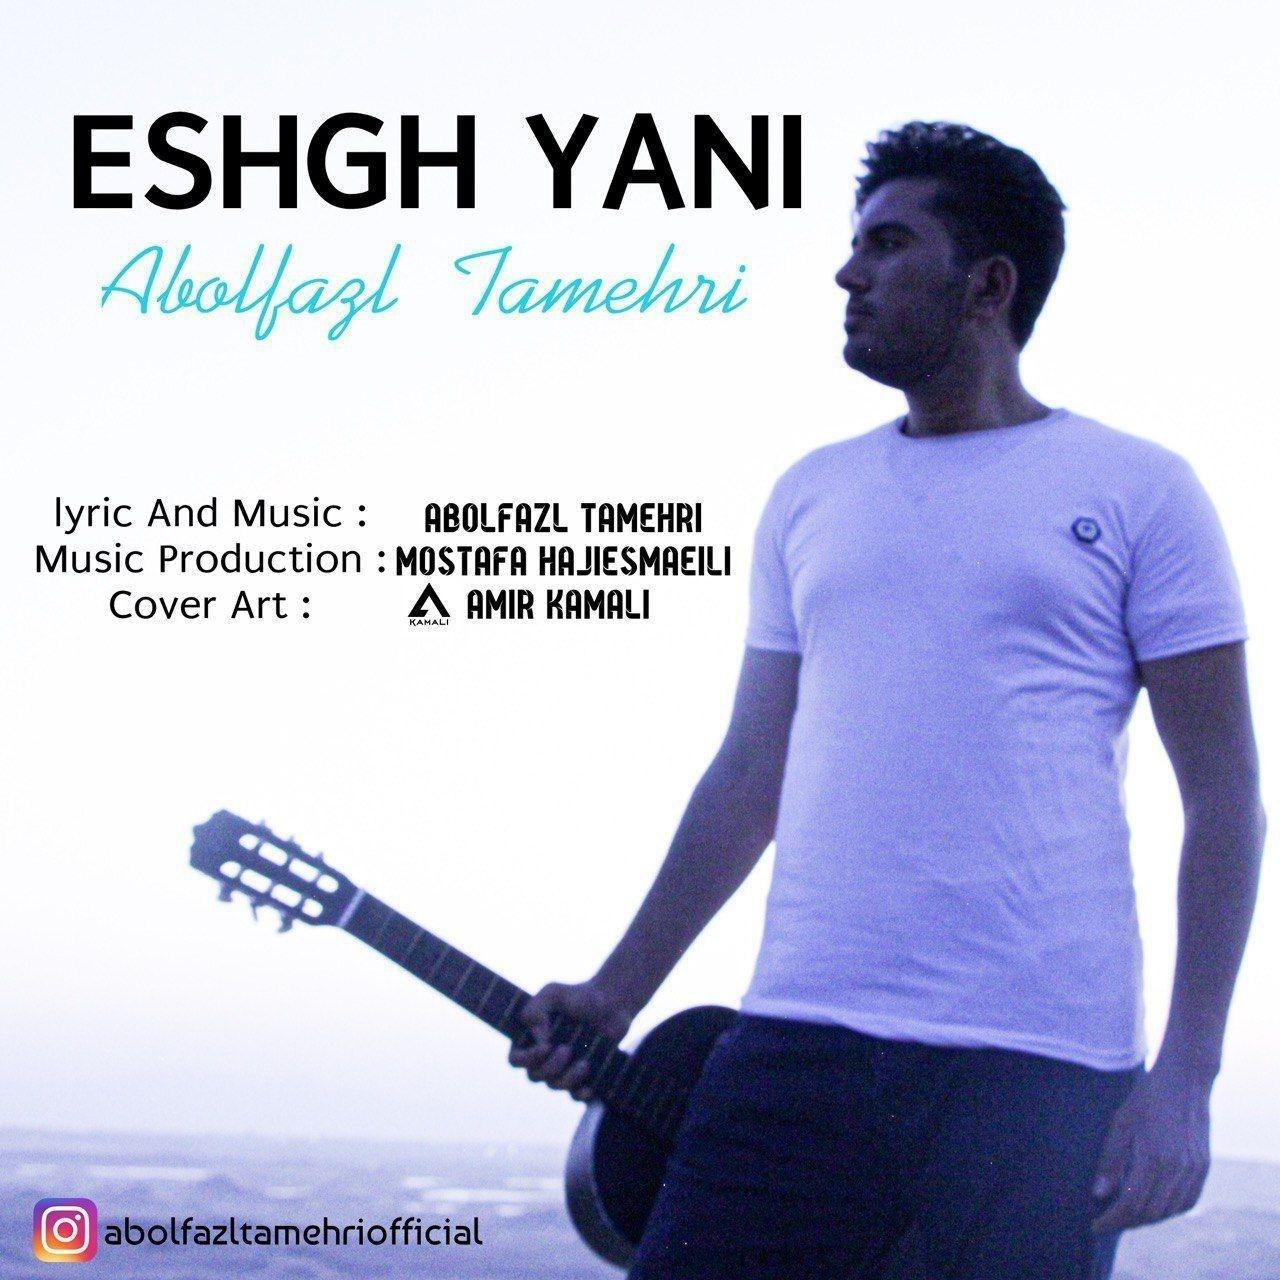 Abolfazl Tamehri – Eshgh Yani